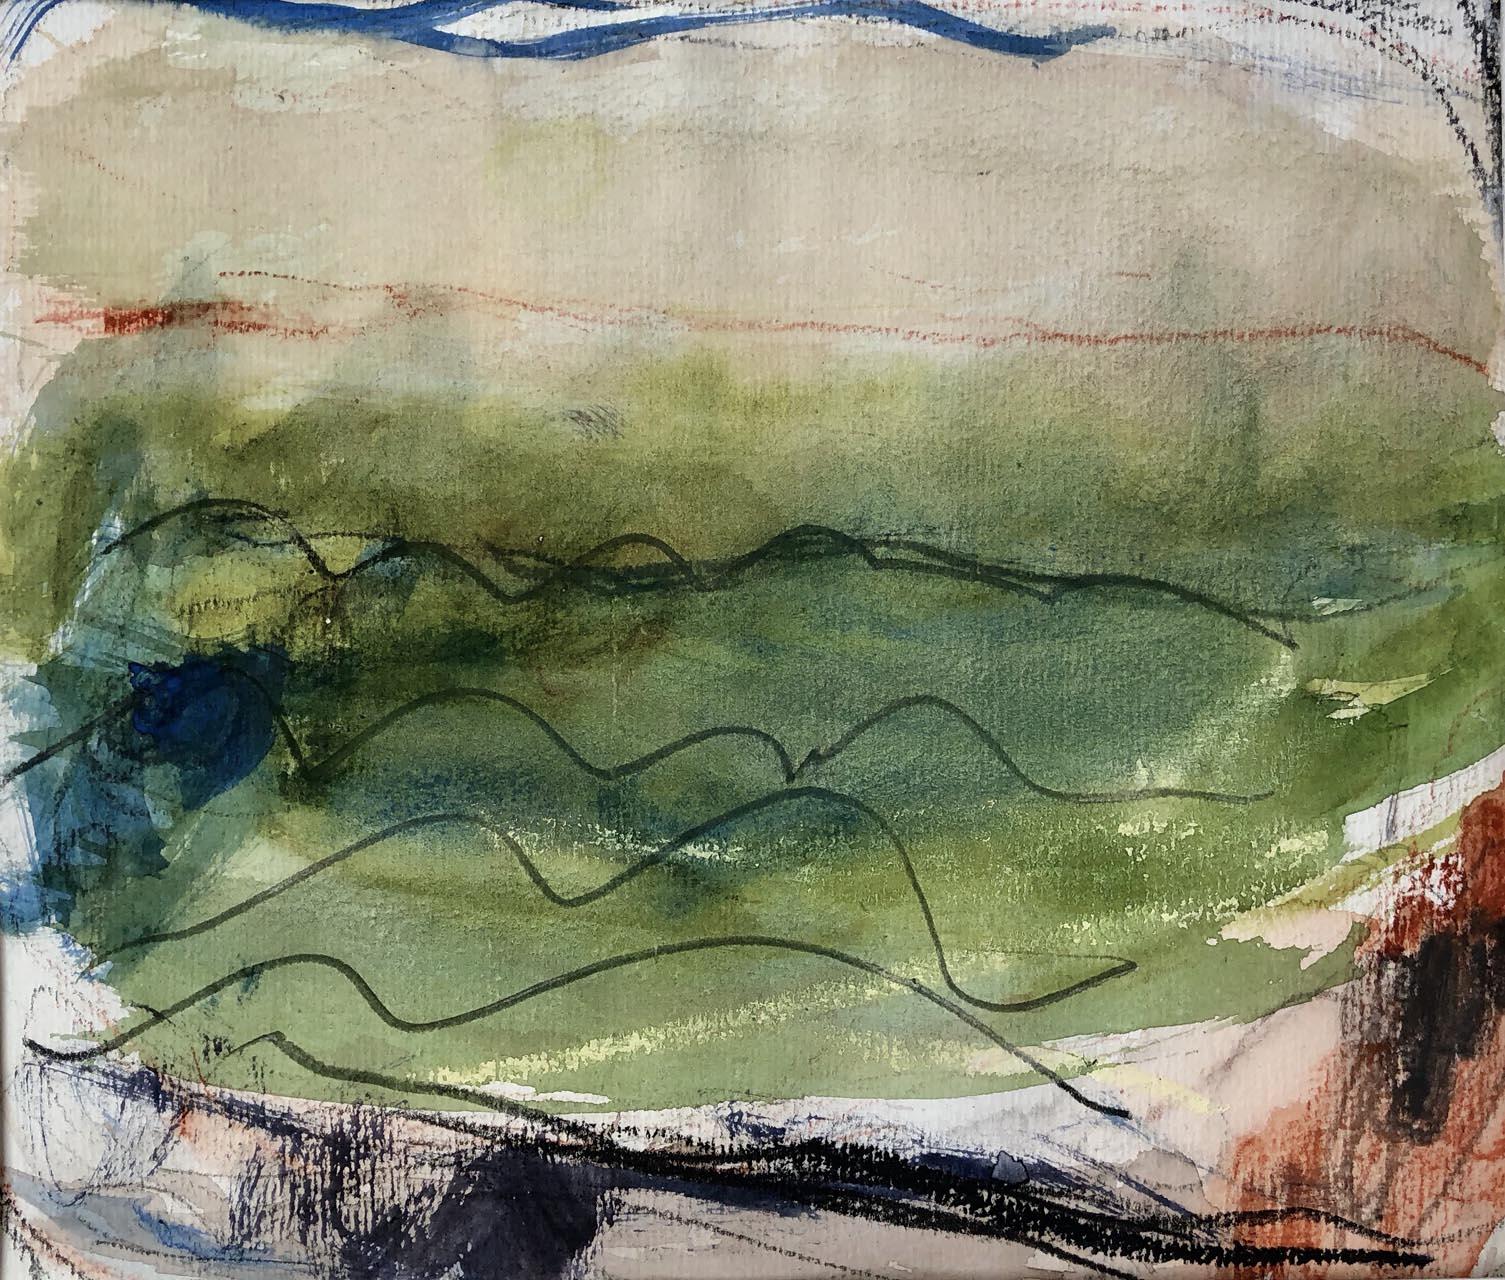 Landschaft-Cori 4-Aquarell-30×40-2018